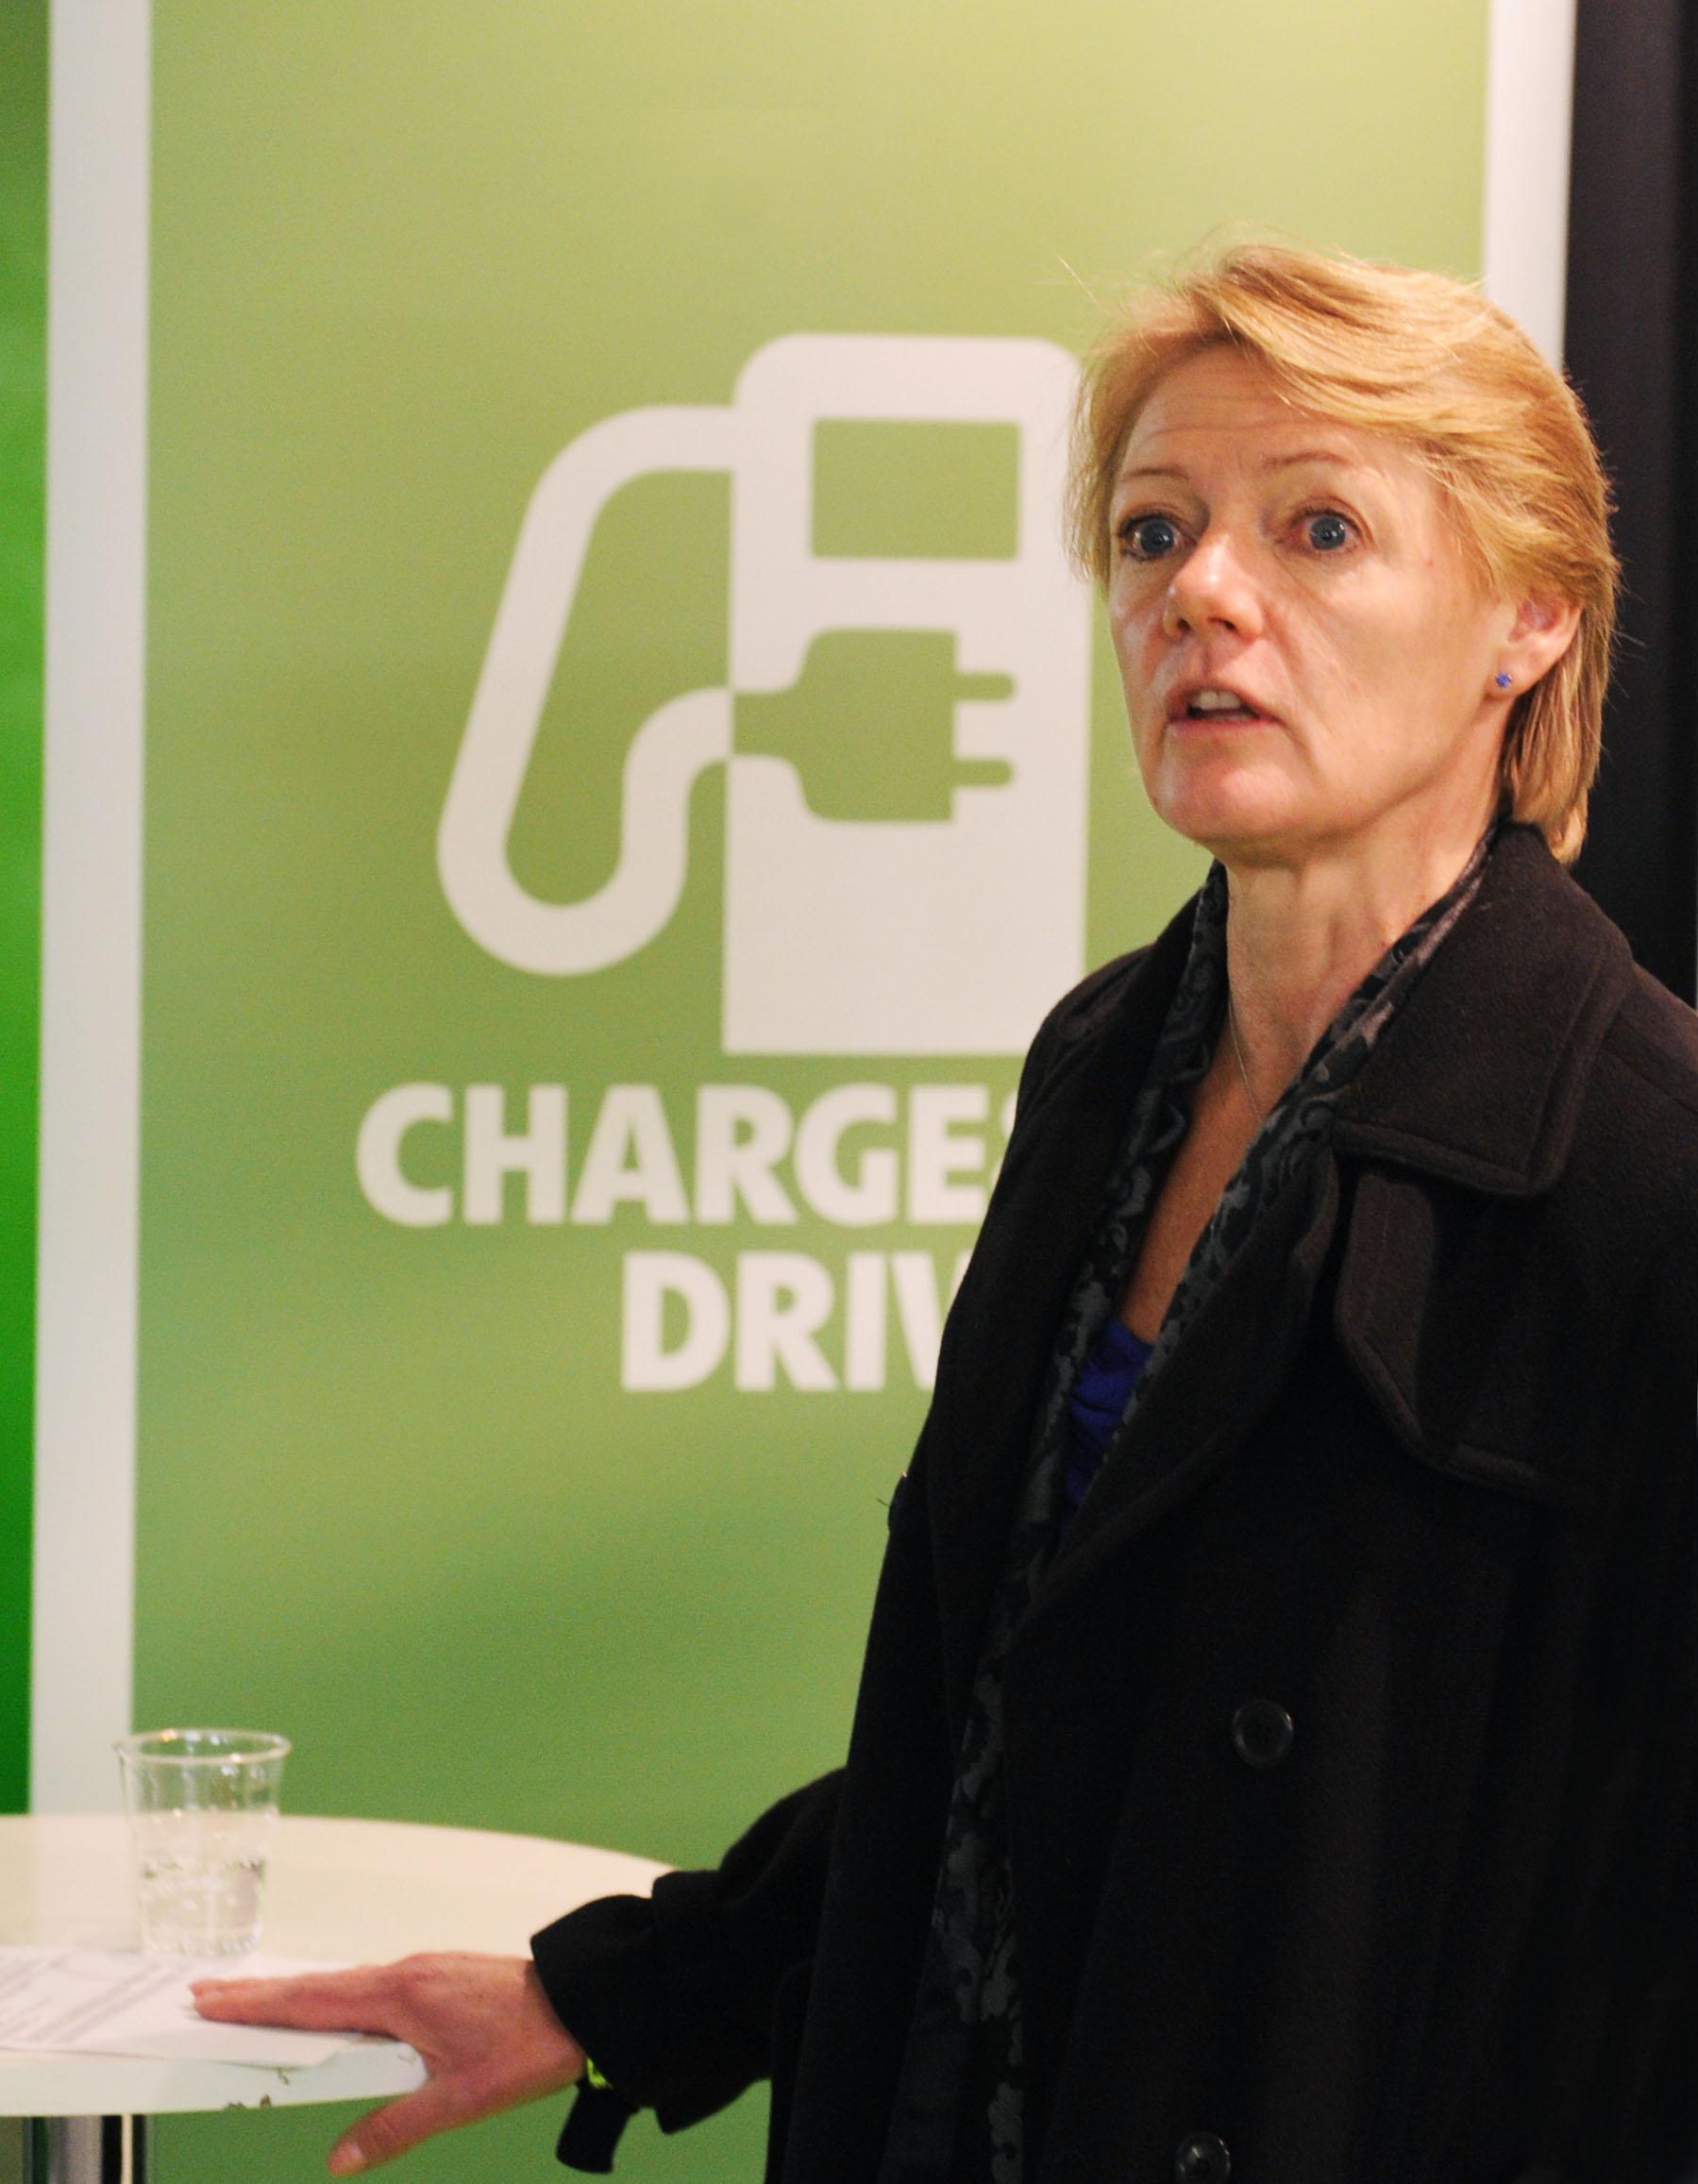 Ulla Hamilton, trafikborgarråd (m), Stockholm stad